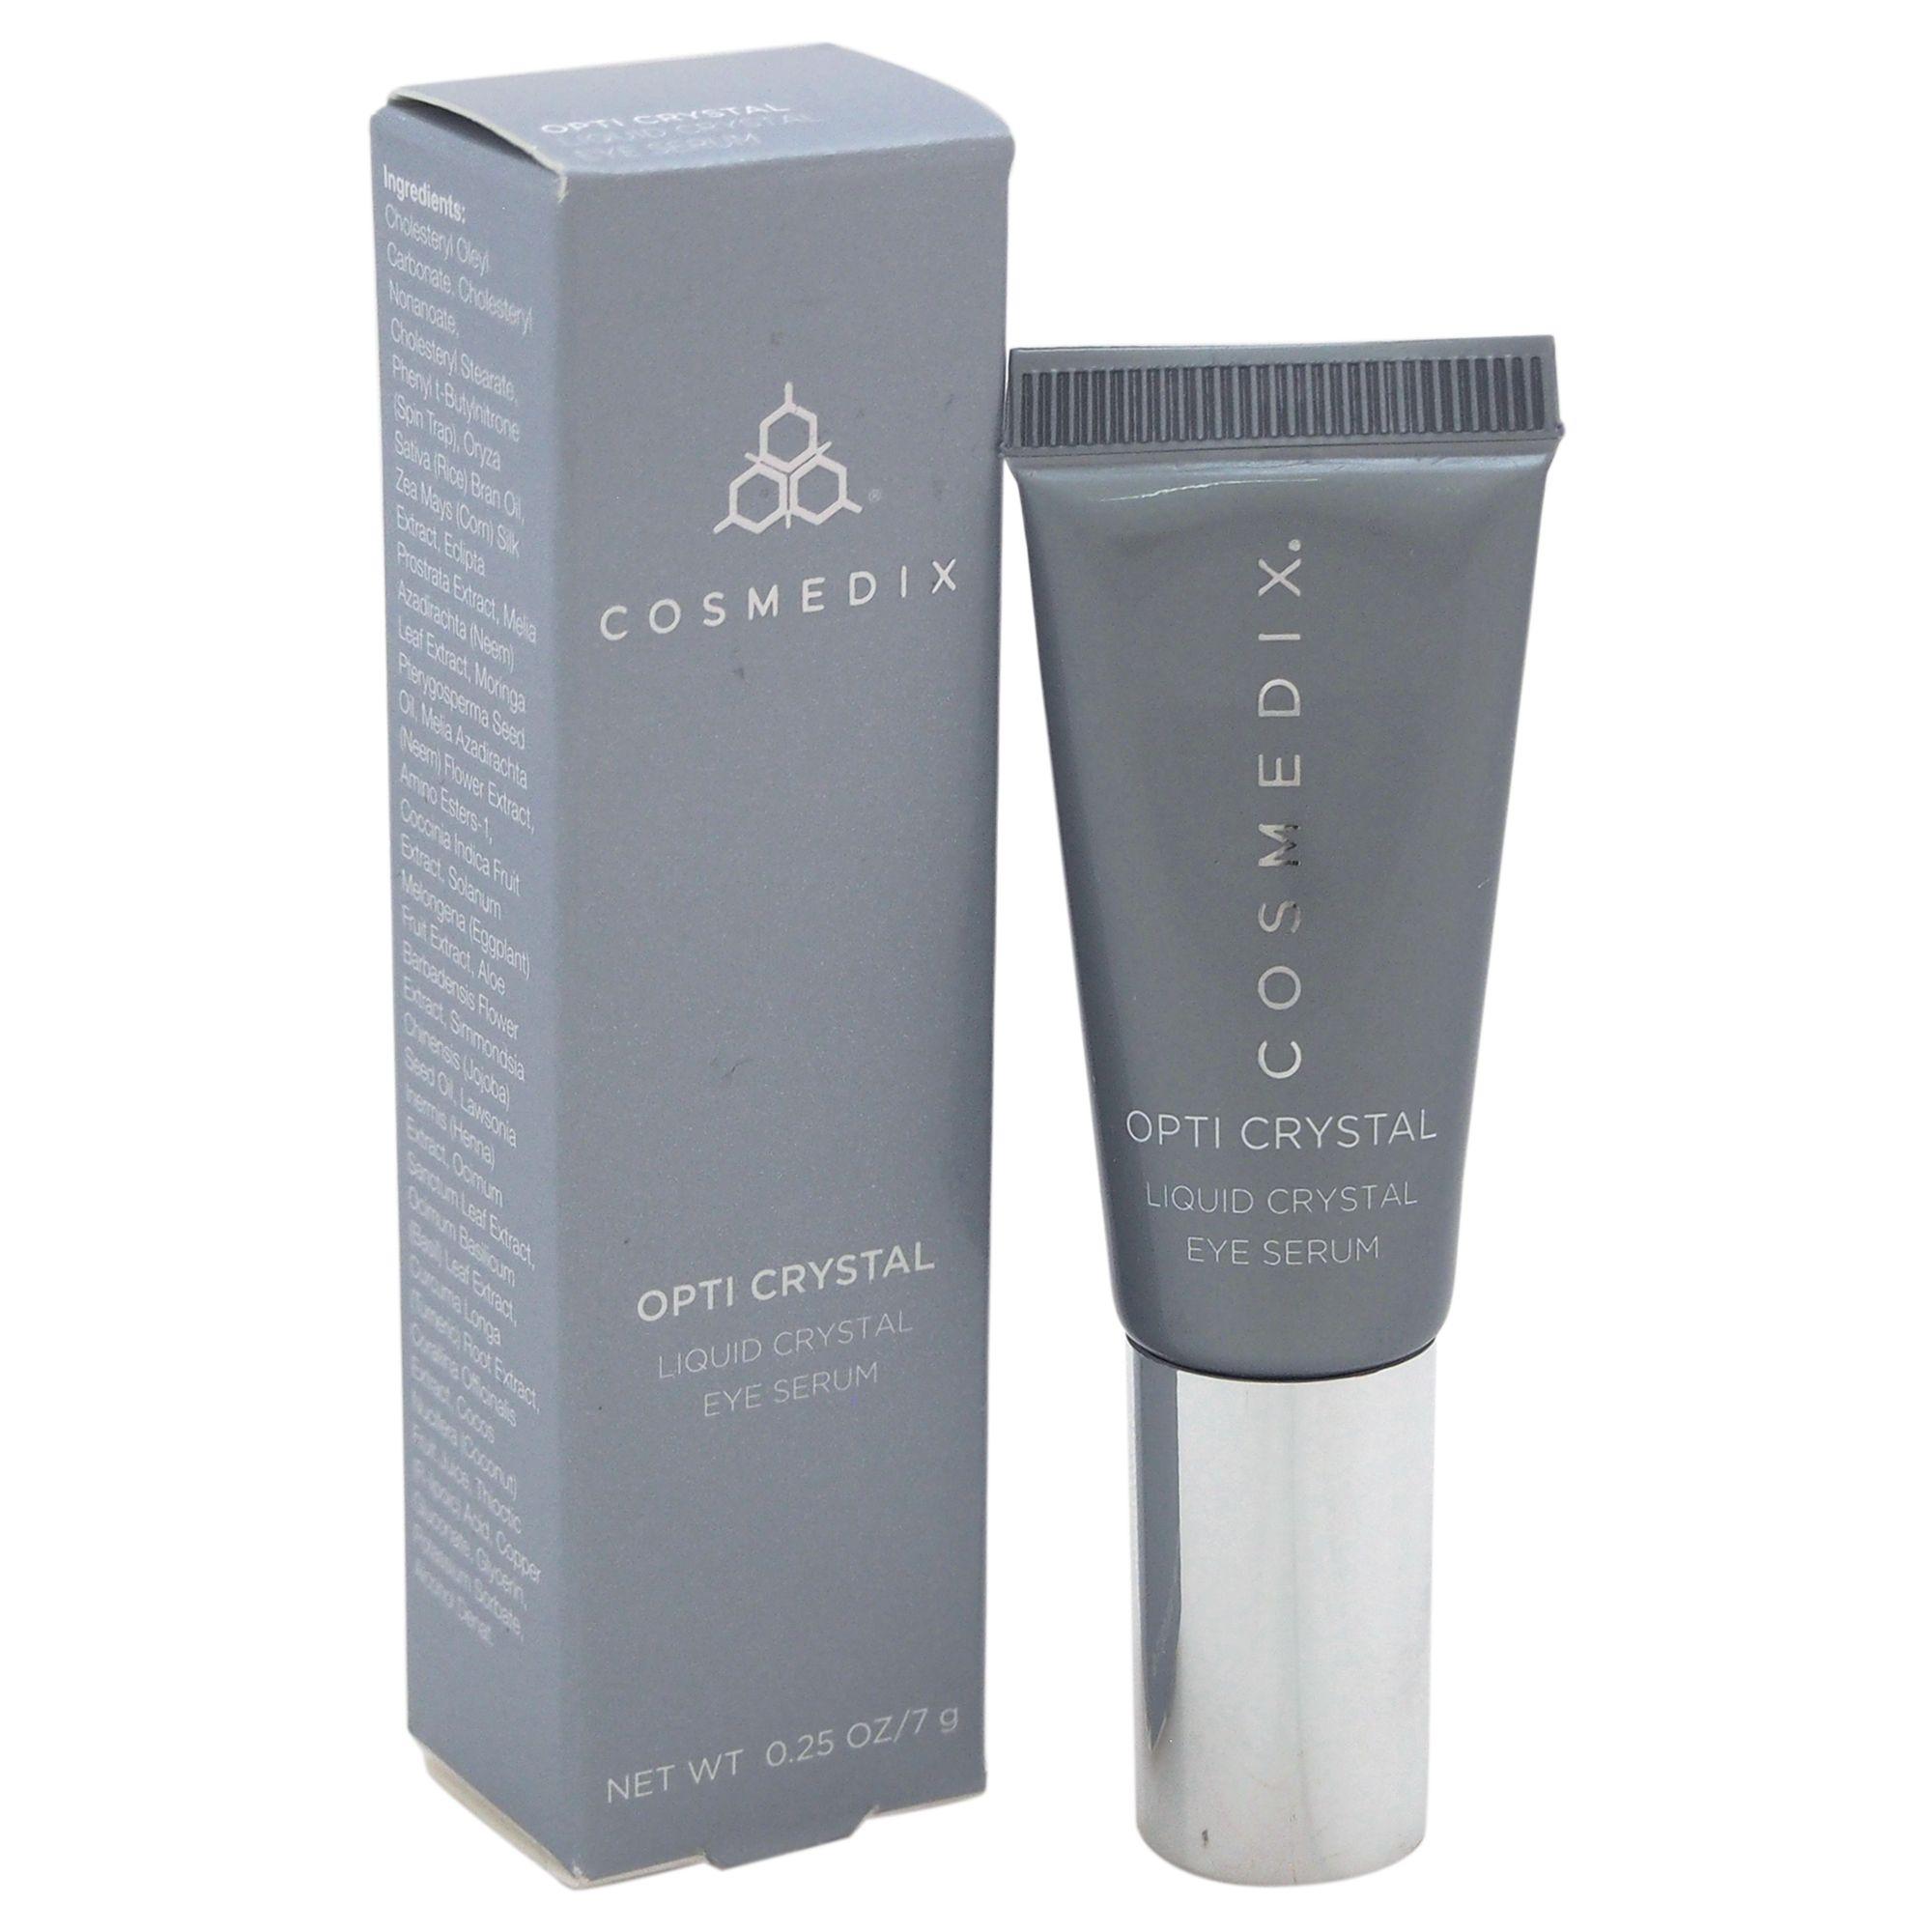 Cosmedix Opti Crystal Liquid Crystal Eye Serum 0 25 Oz Walmart Com Eye Serum Serum Crystal Eye